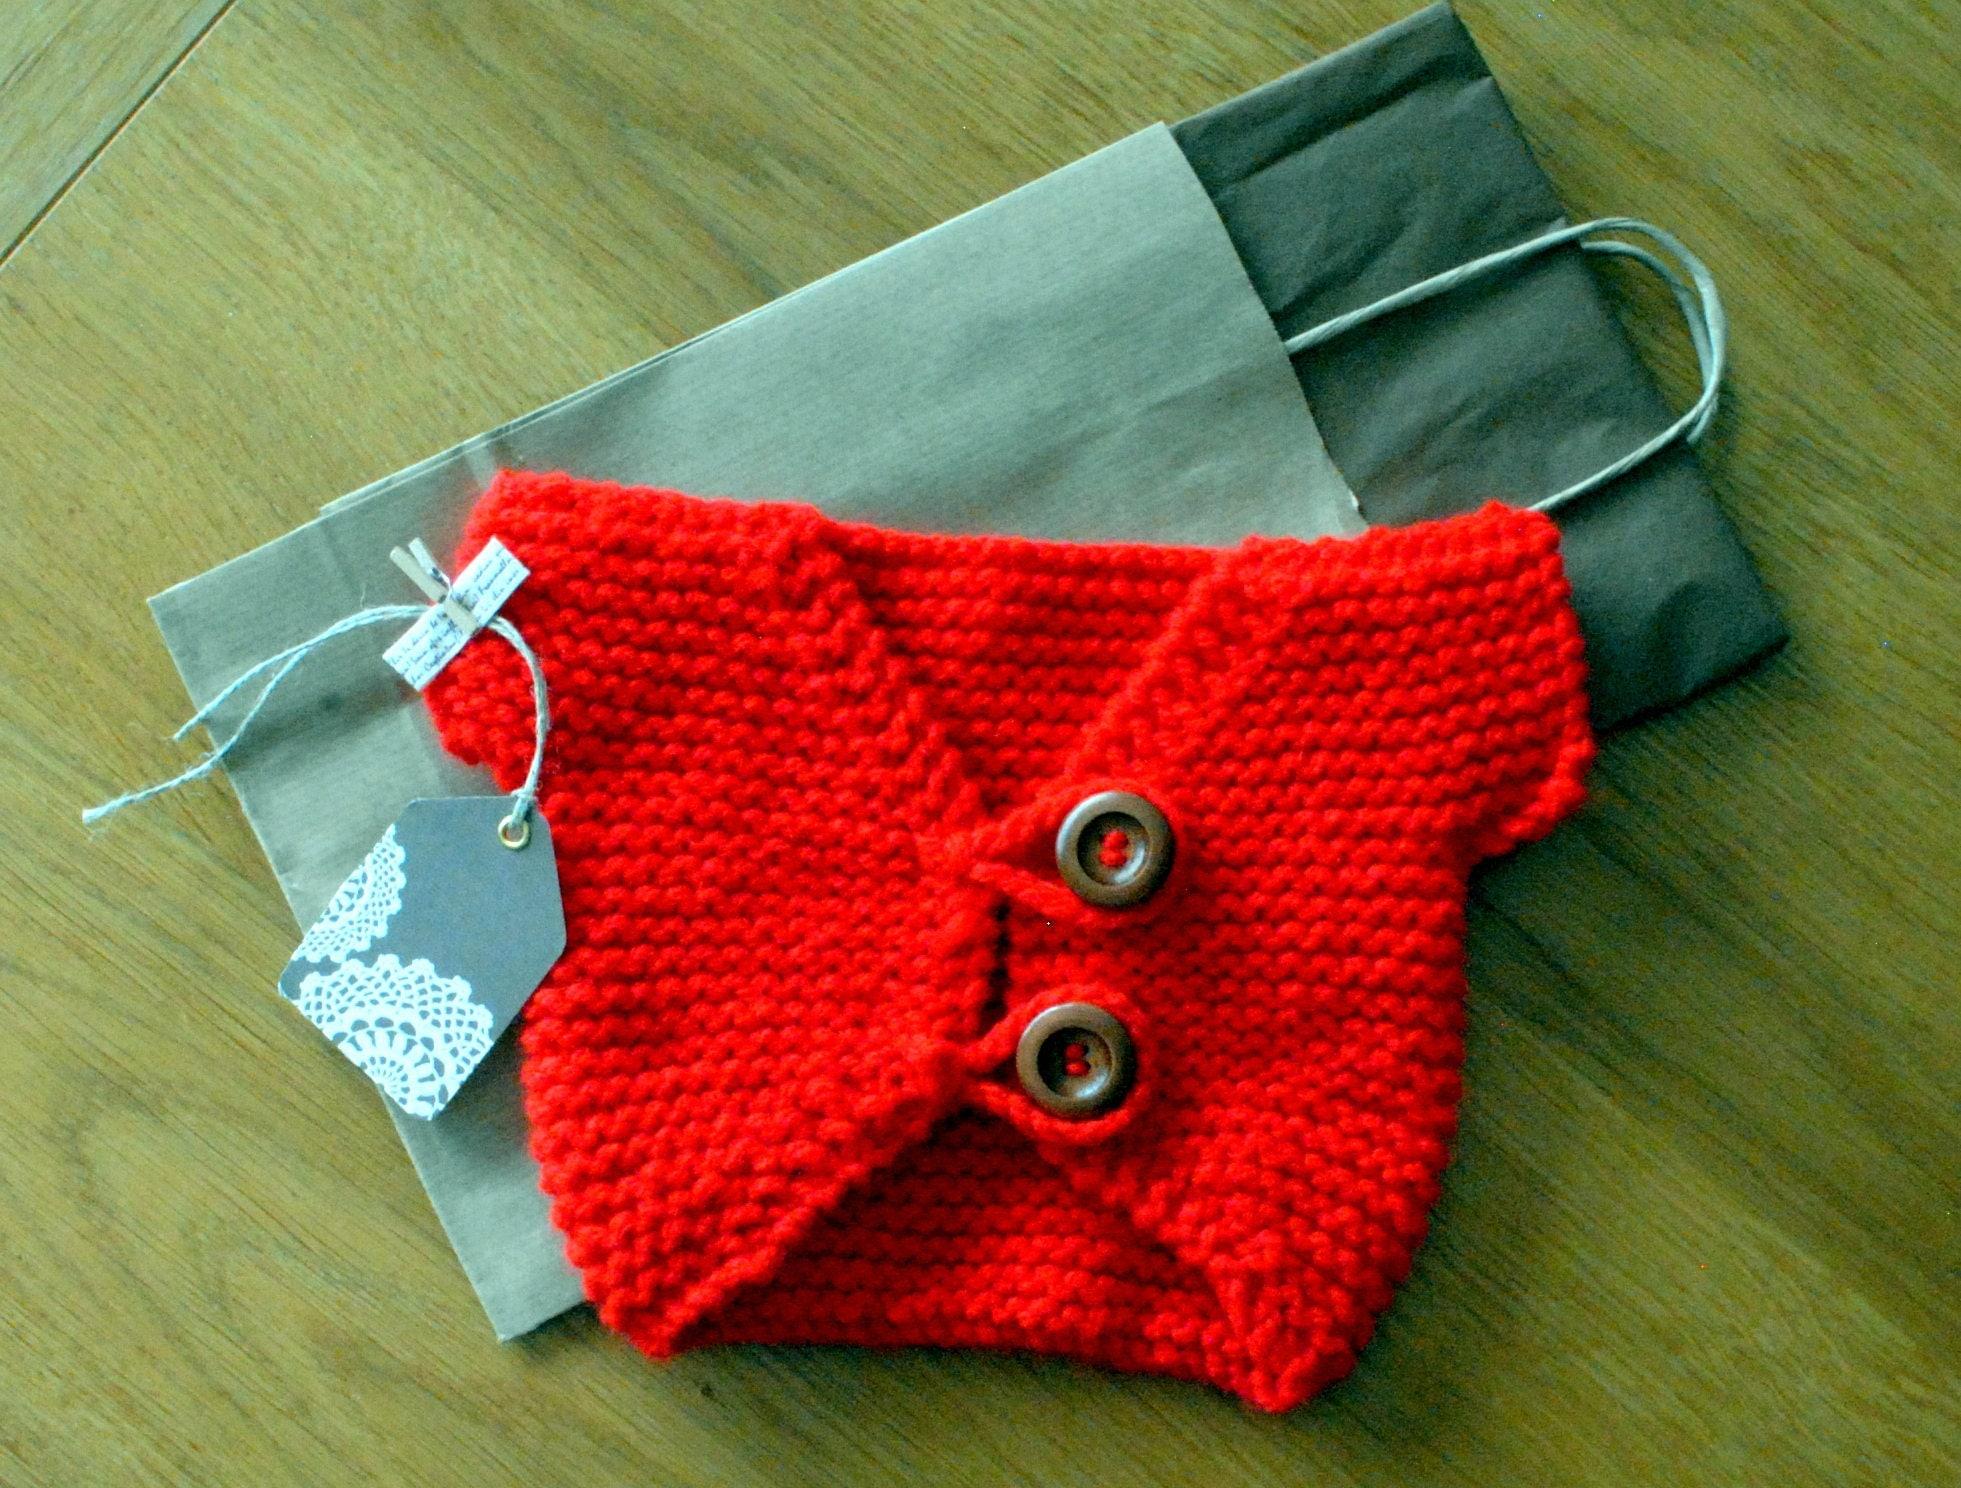 Baby Gift Knitted Baby Clothes Handmade Chunky Knit Cardigan Jacket Red Boho Baby Shrug Bolero Newborn Baby Shower Homecoming Gift